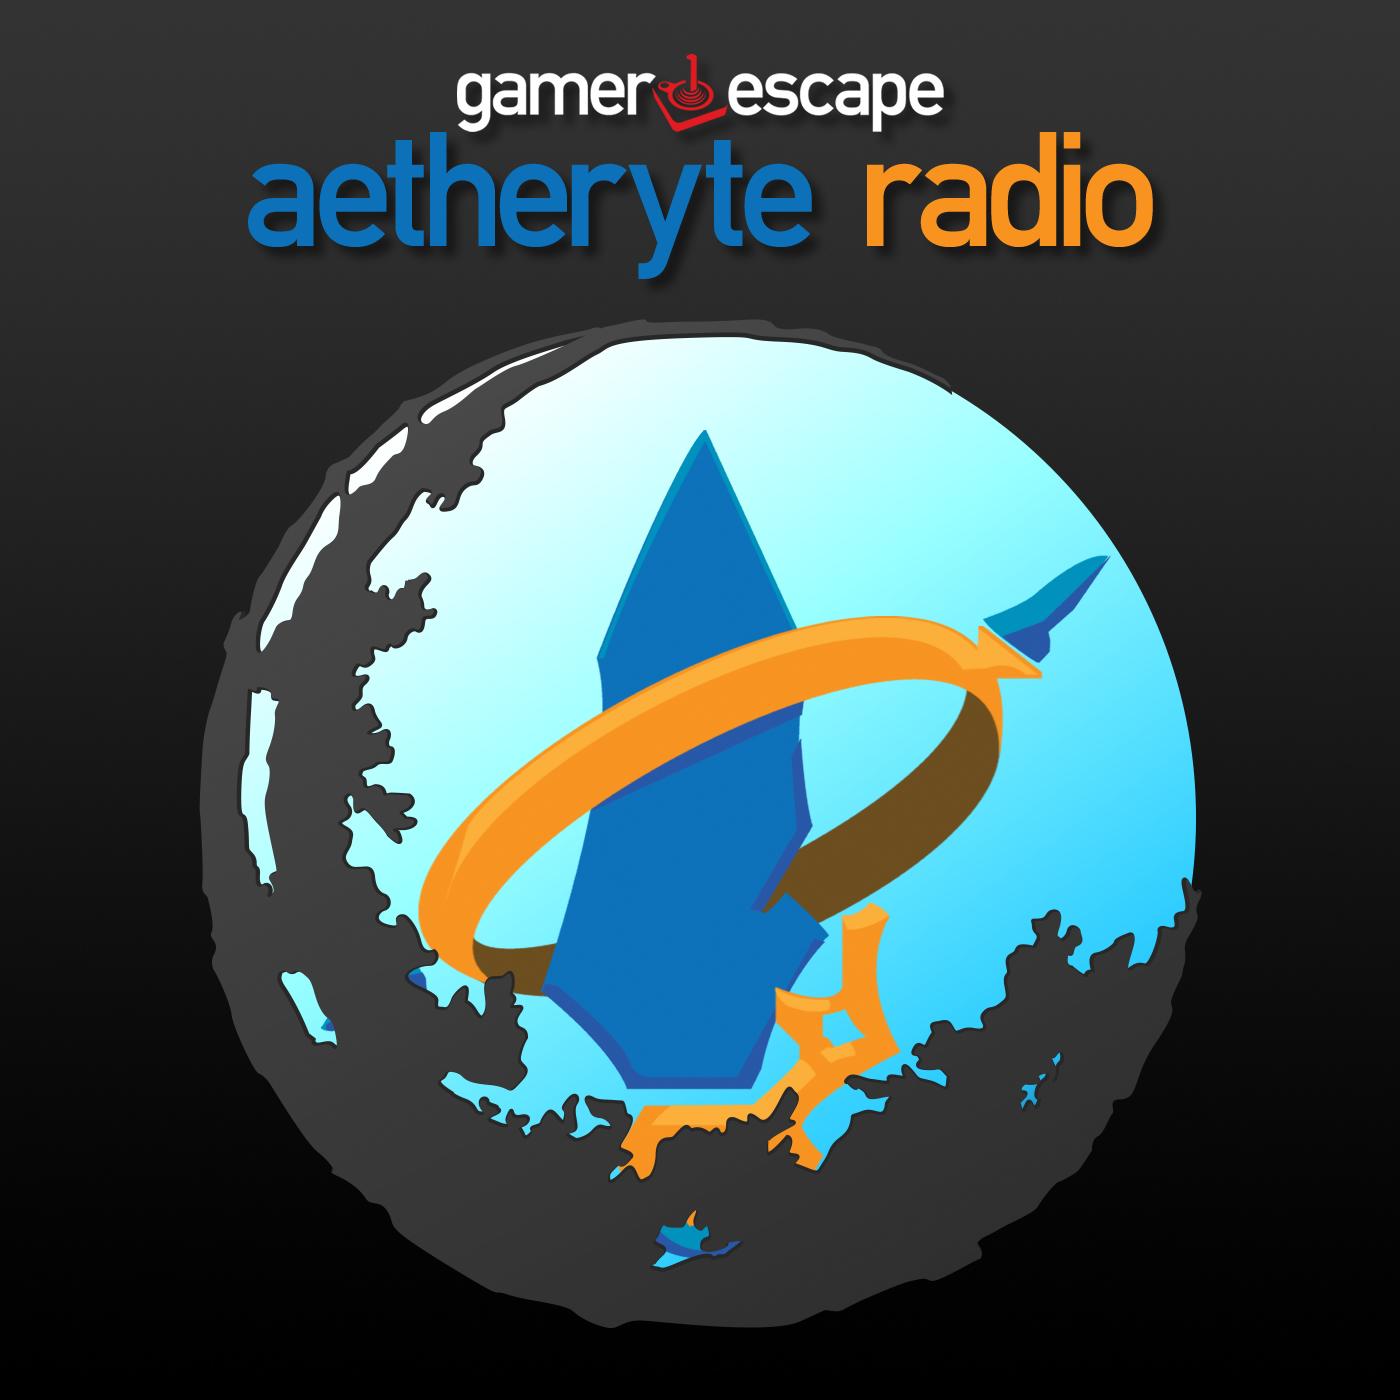 Aetheryte Radio - A Final Fantasy XIV A Realm Reborn Podcast